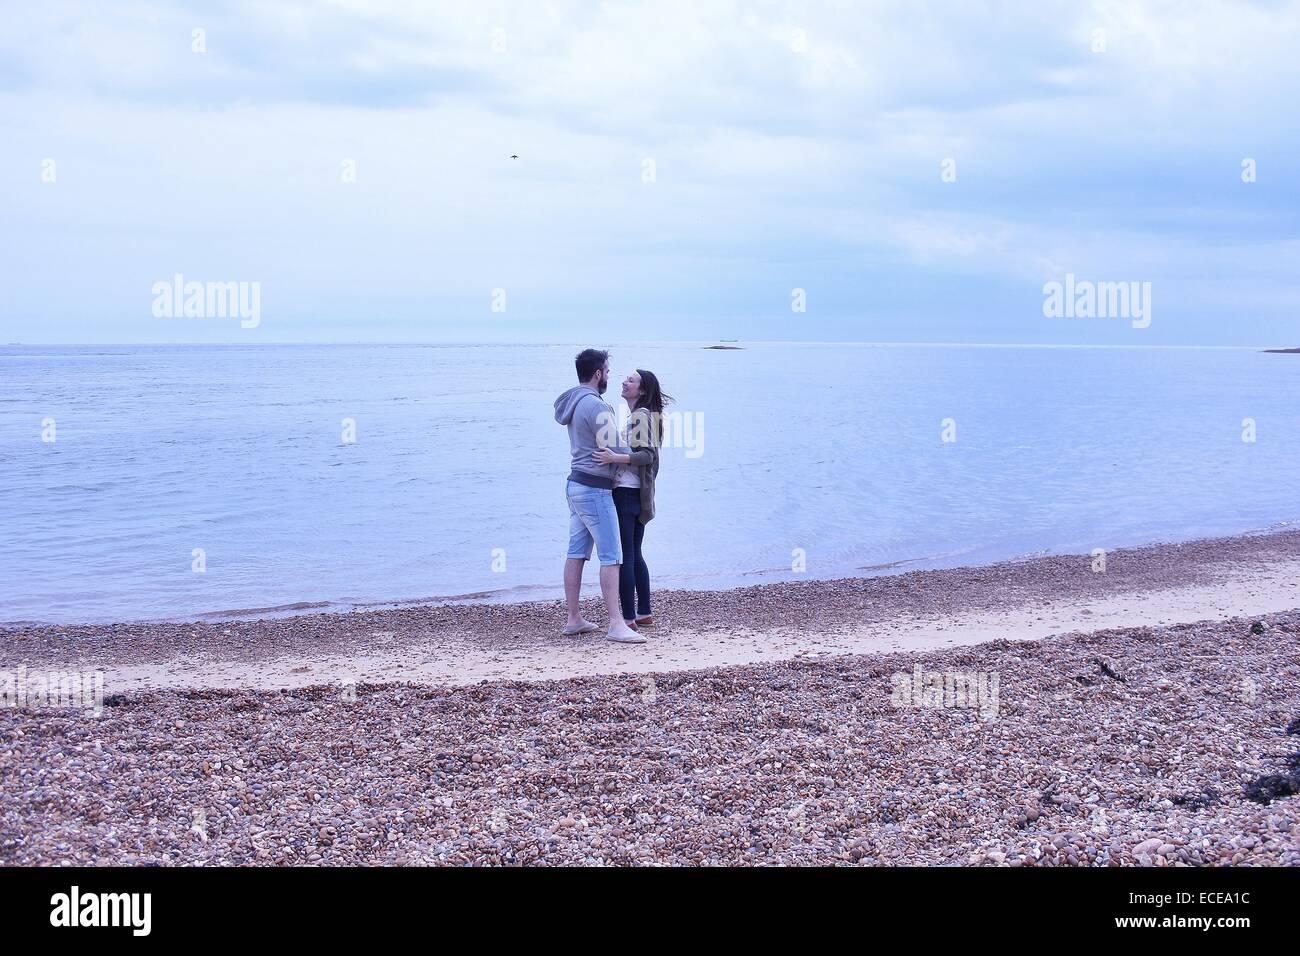 Couple standing on beach - Stock Image